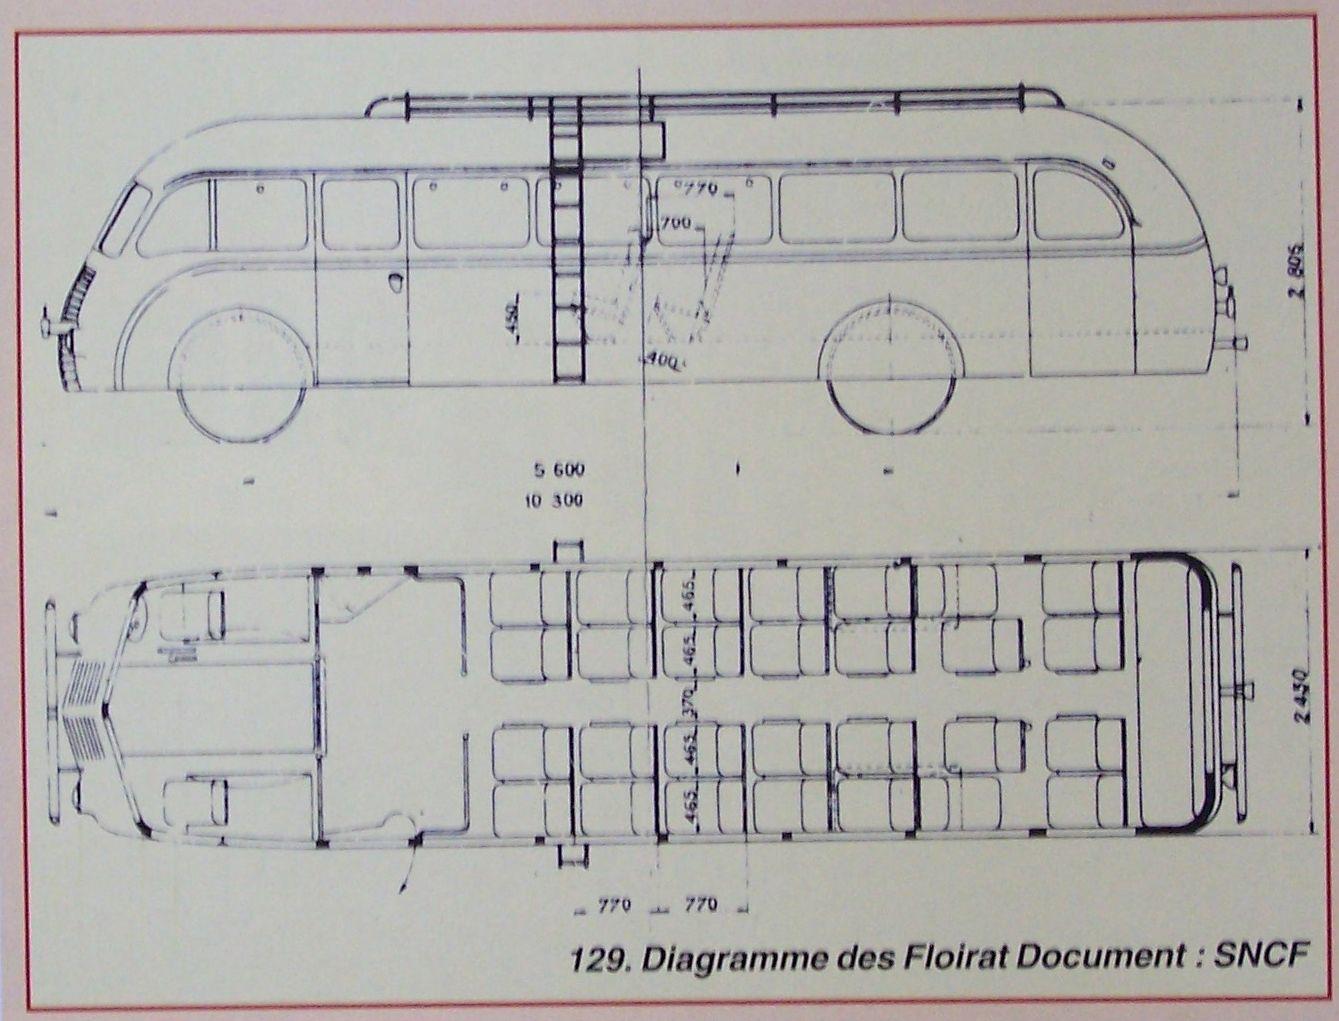 Floirat Buses France Myn Transport Blog Scania Irizar Wiring Diagram 5006 5007 Et 5701a5708